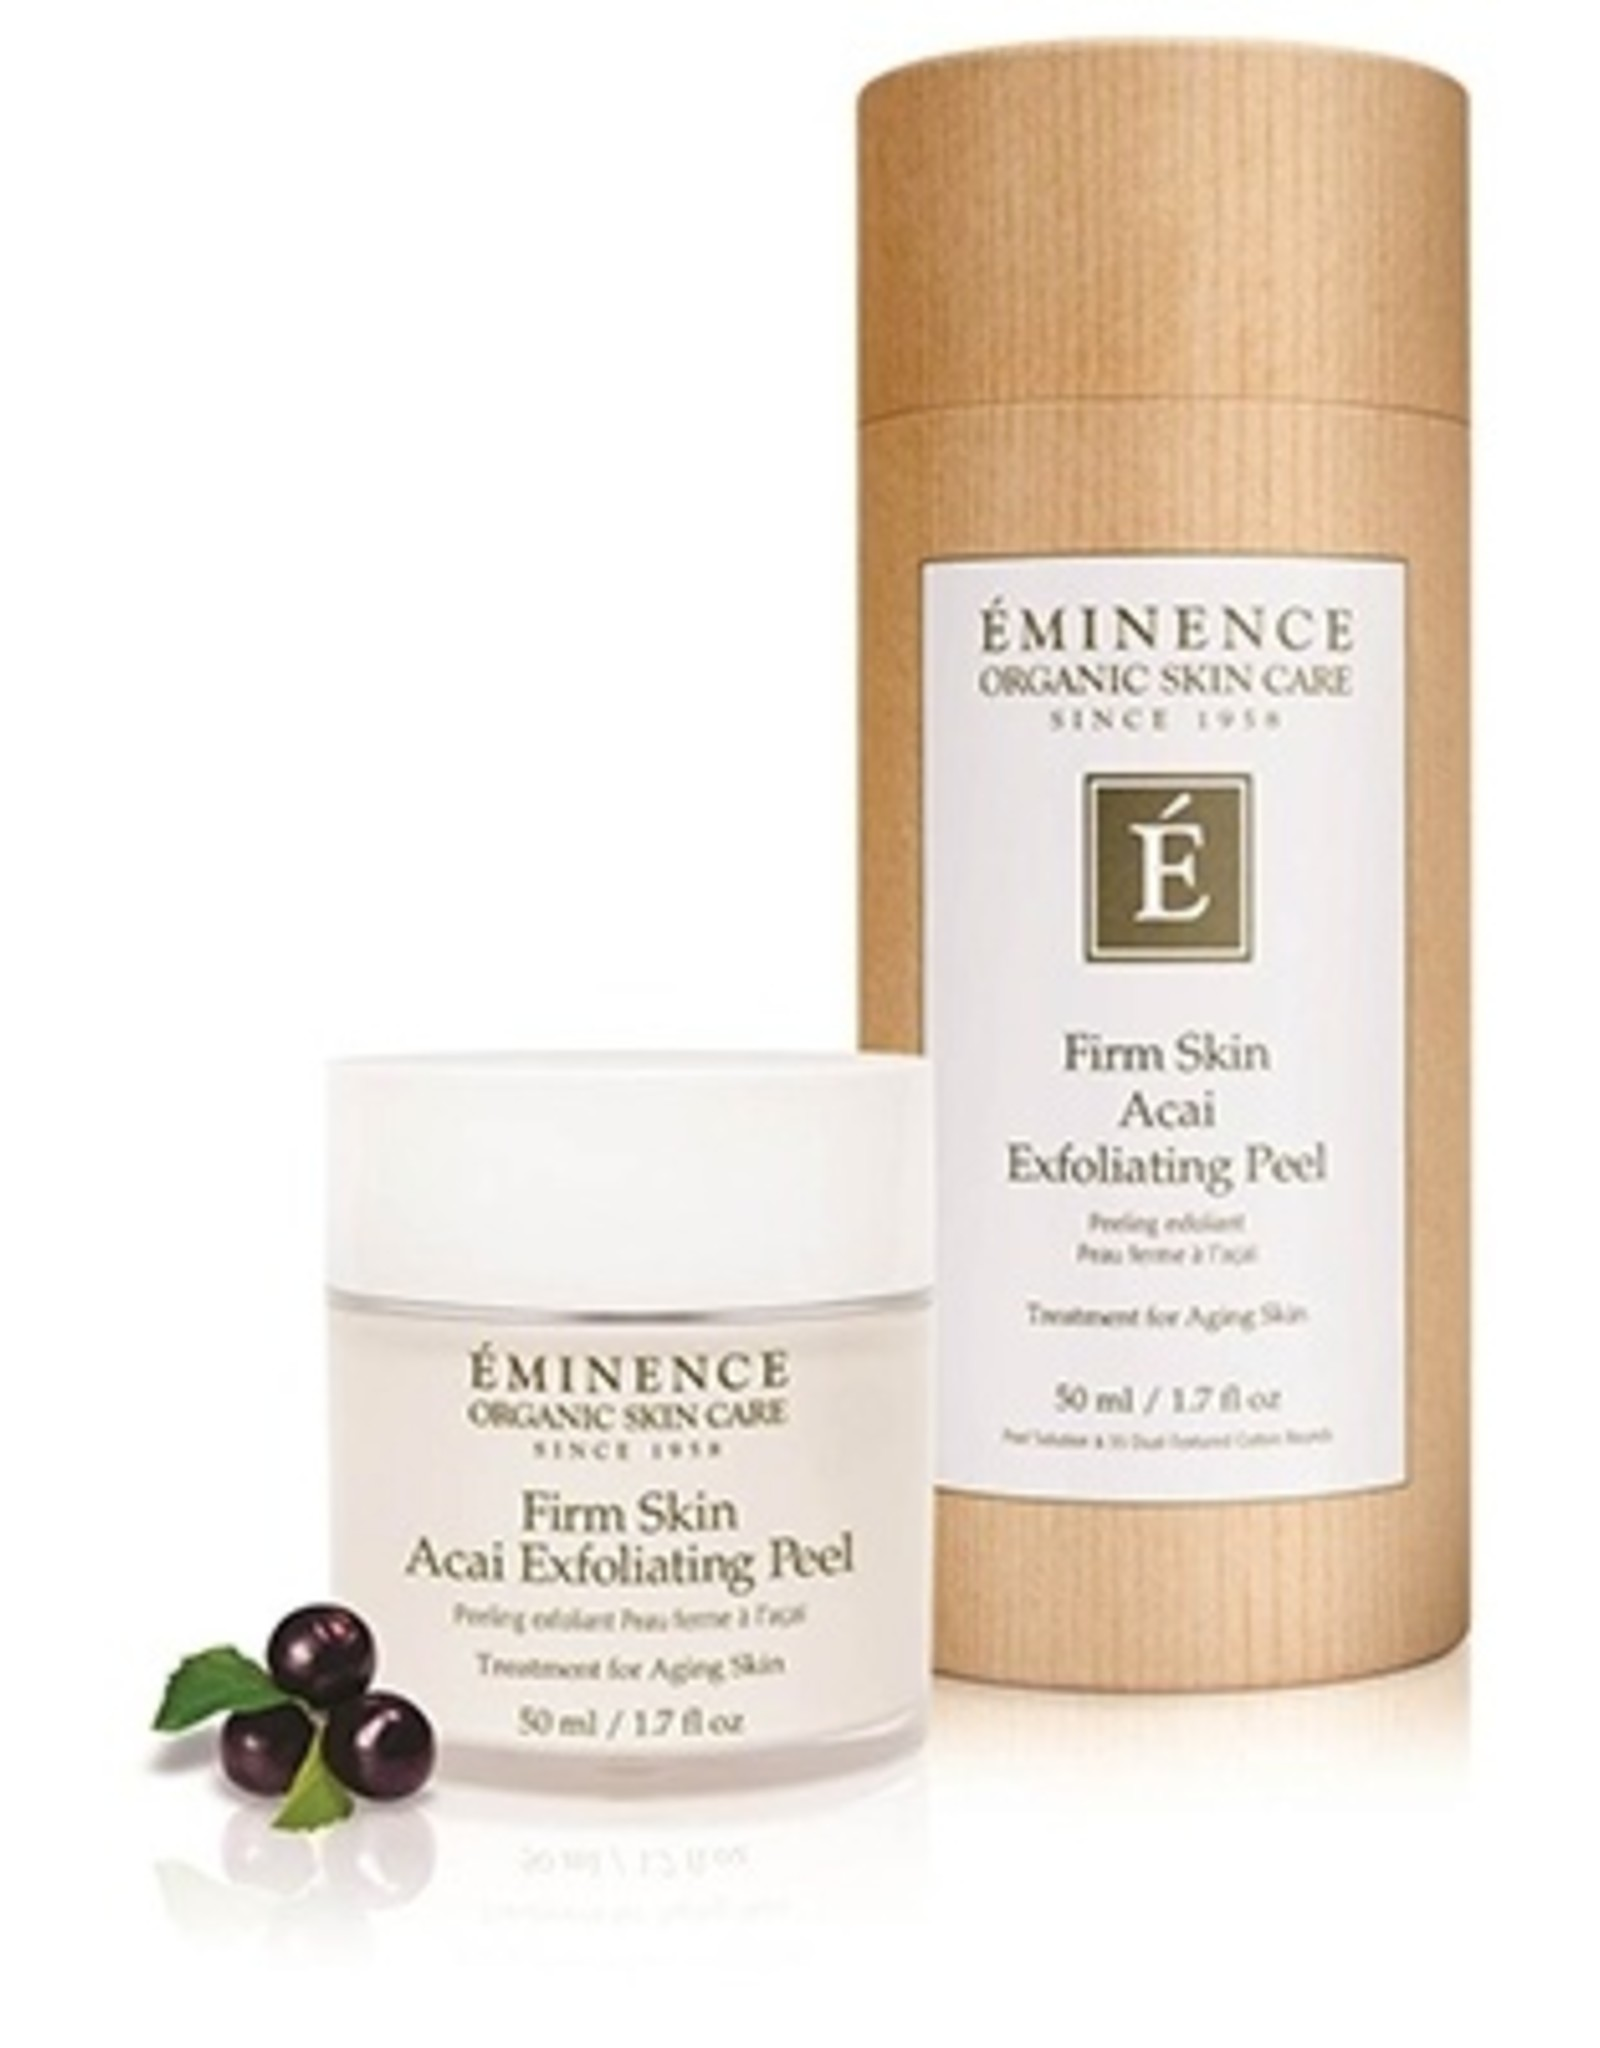 Eminence Organic Skin Care *Firm Skin Acai Exfoliating Peel